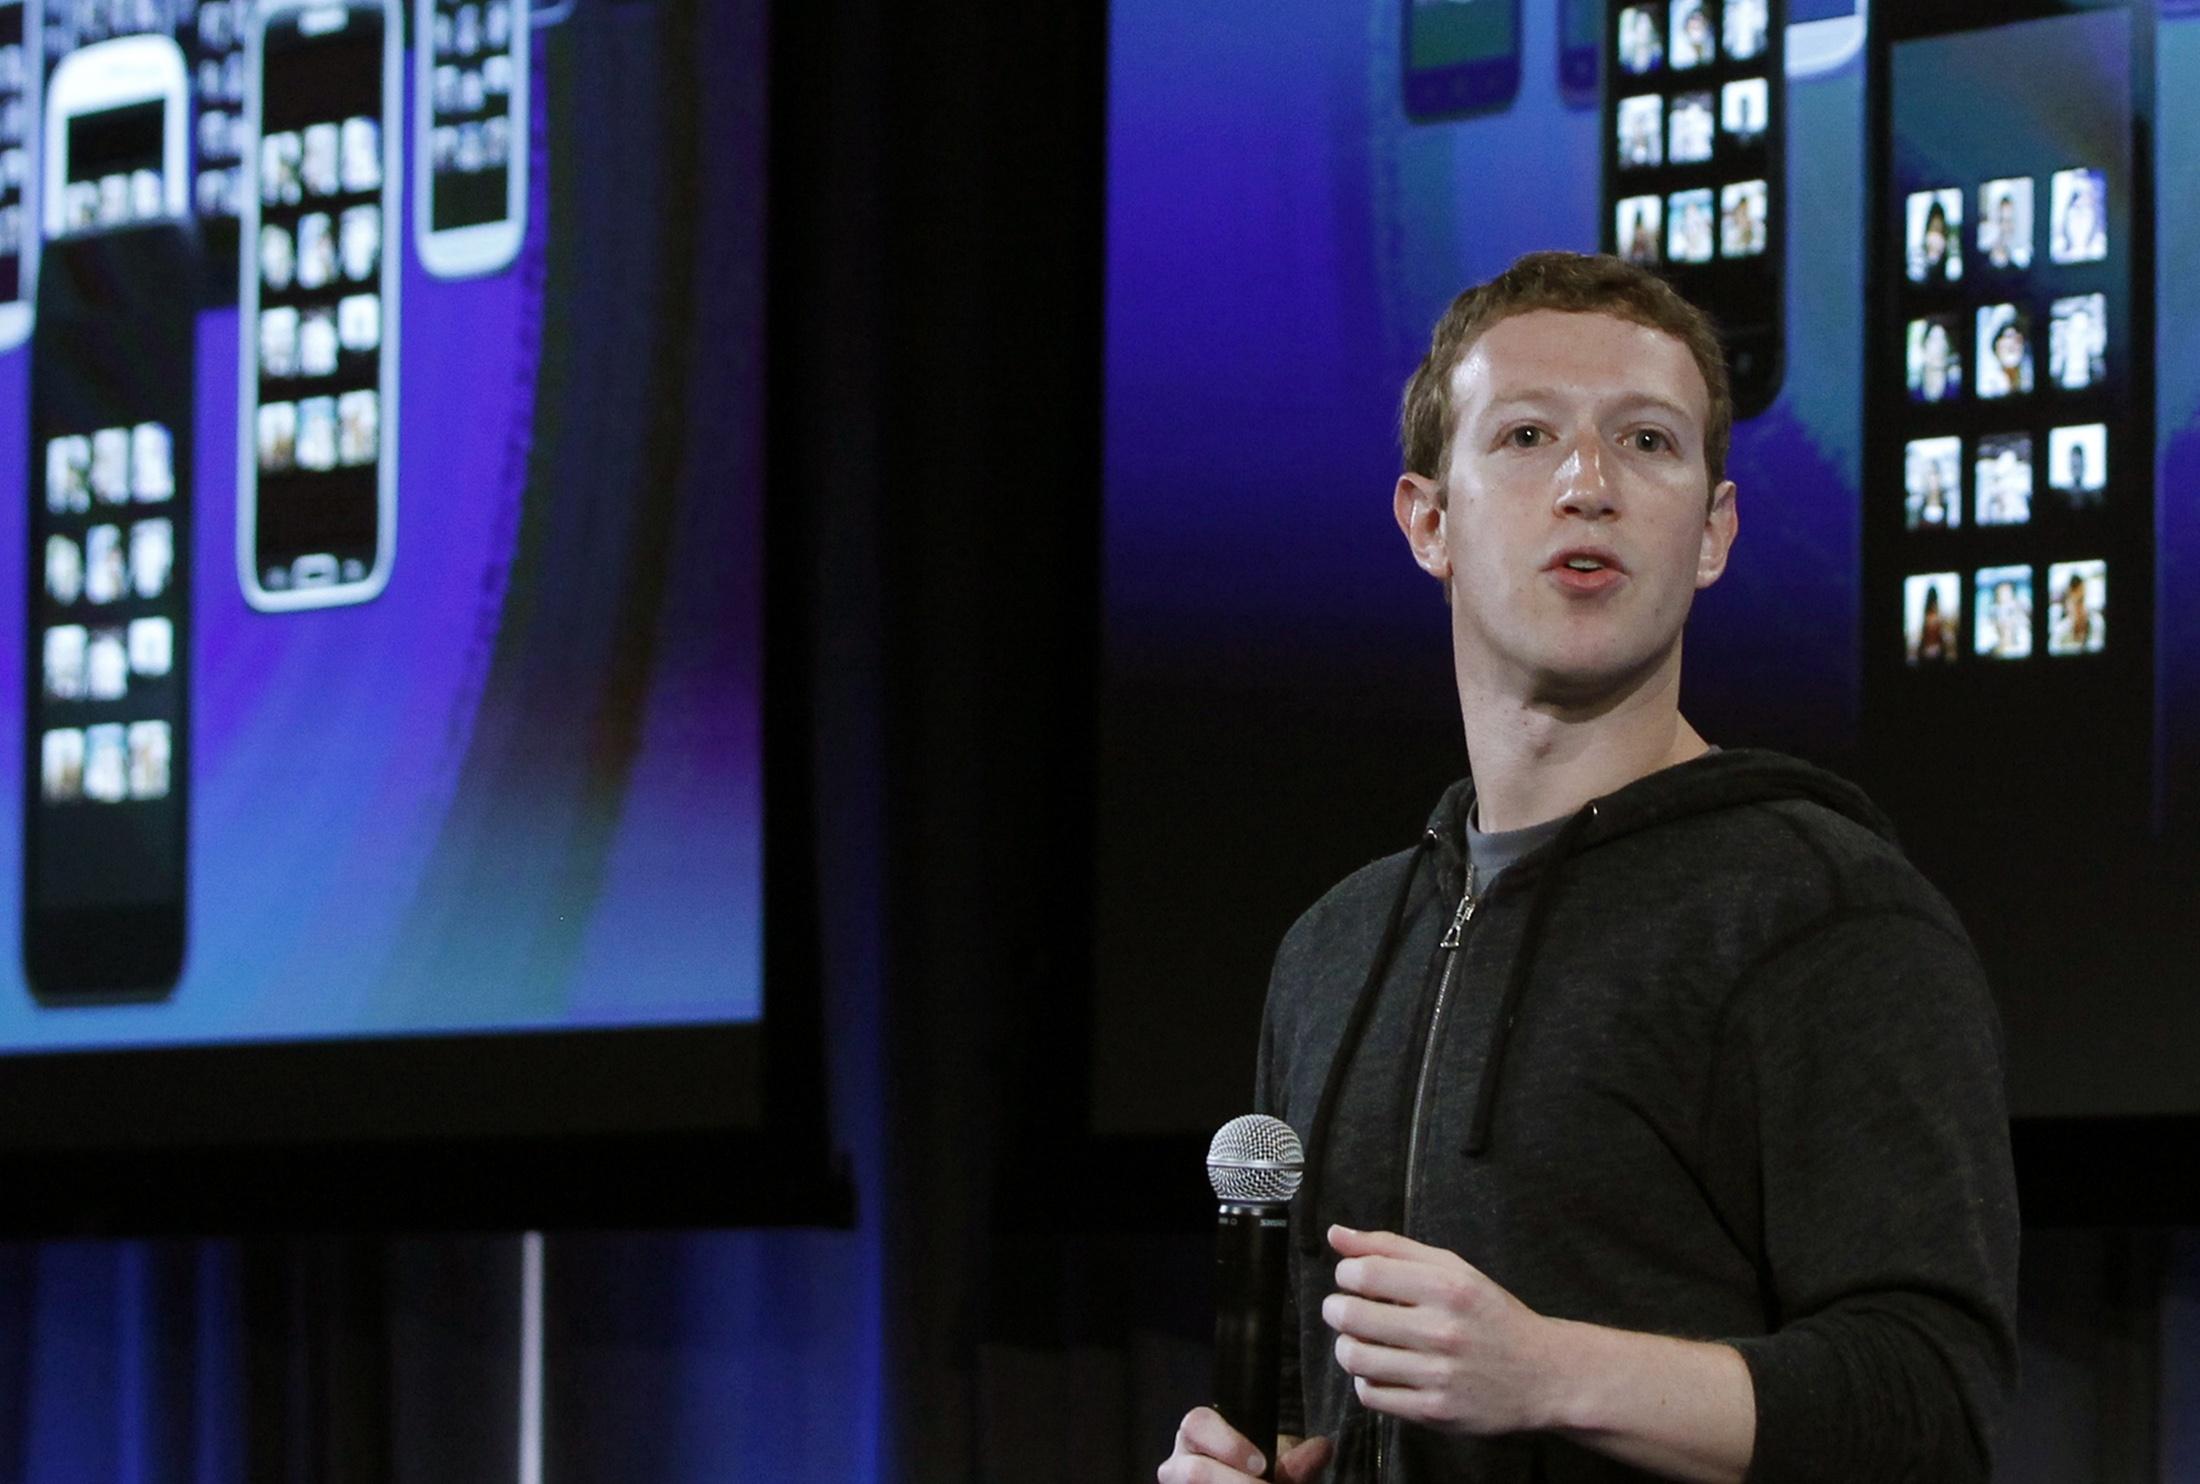 Zuckerberg says US government threat to Internet